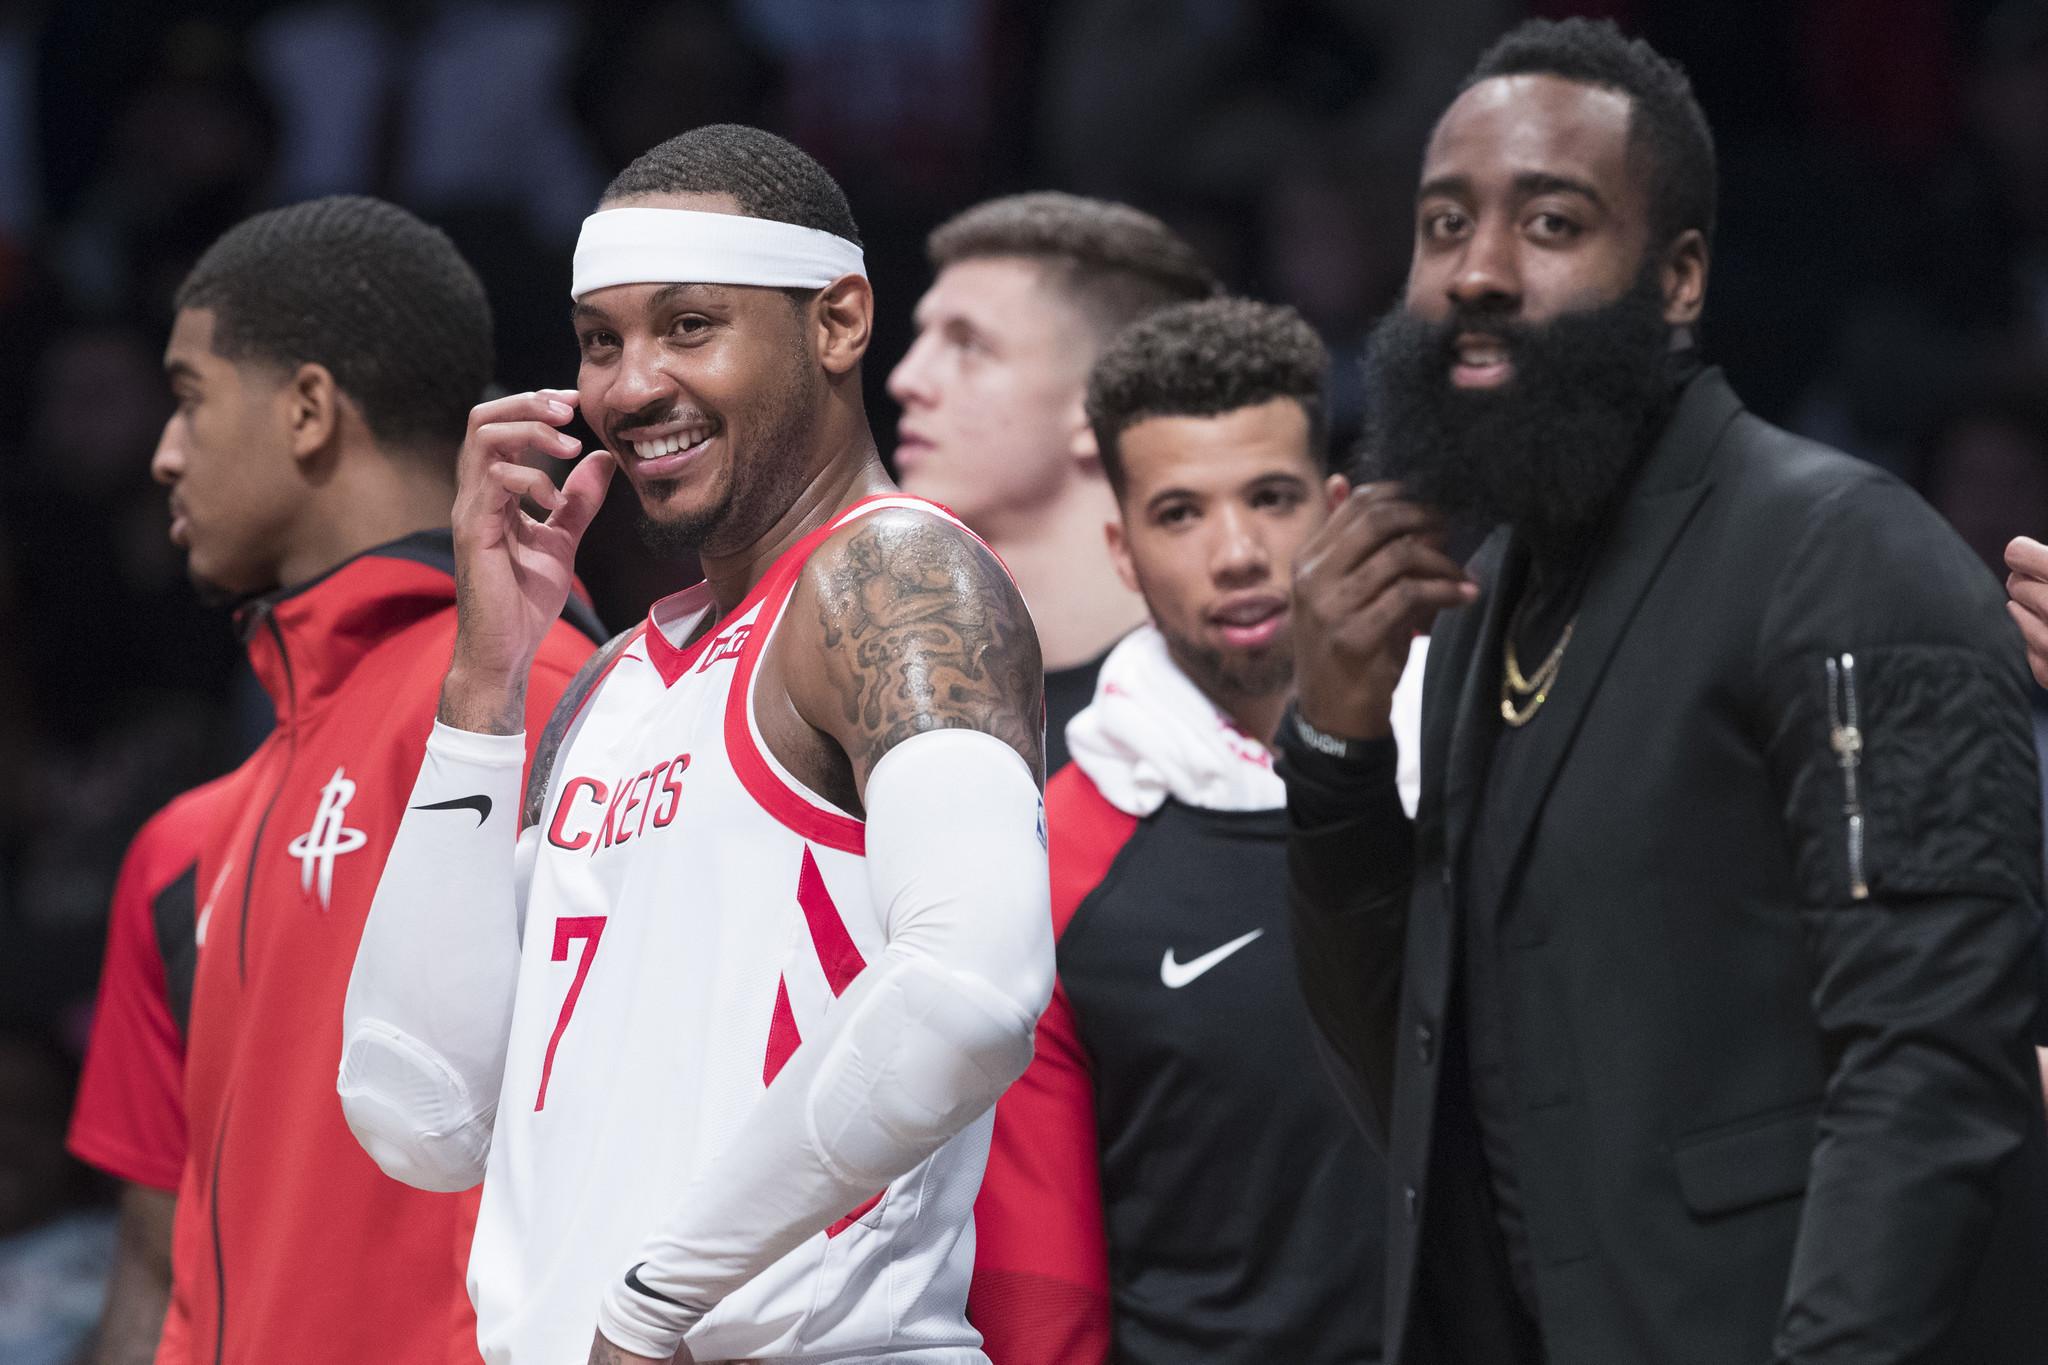 ab21d890e32e No Carmelo Anthony as Rockets face Knicks  James Harden brings his scoring  streak to the